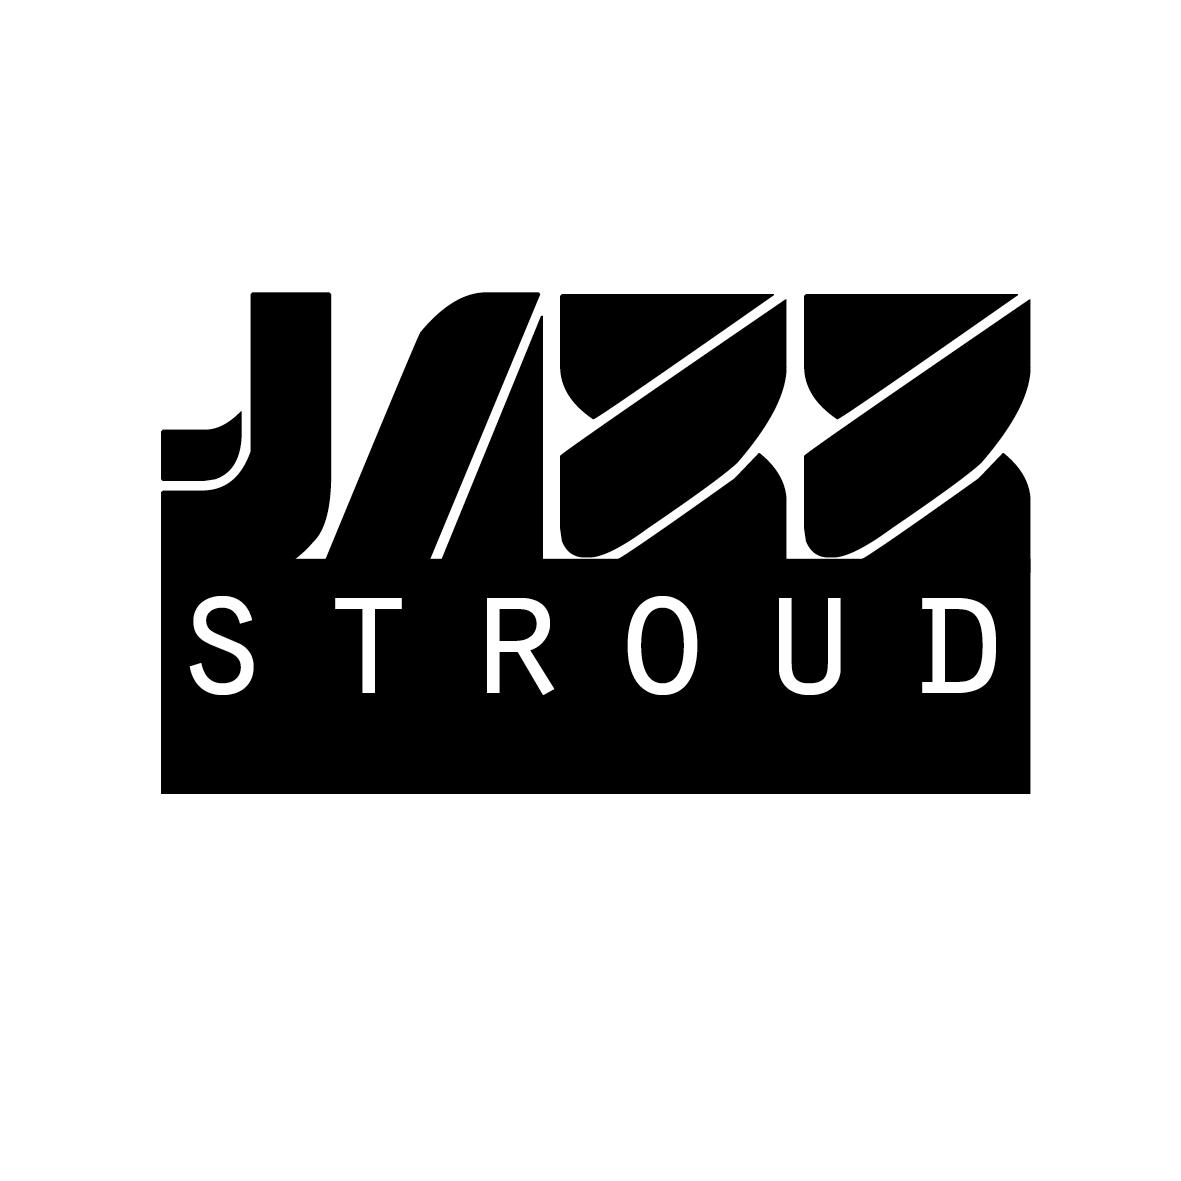 jazz logo 1.jpg